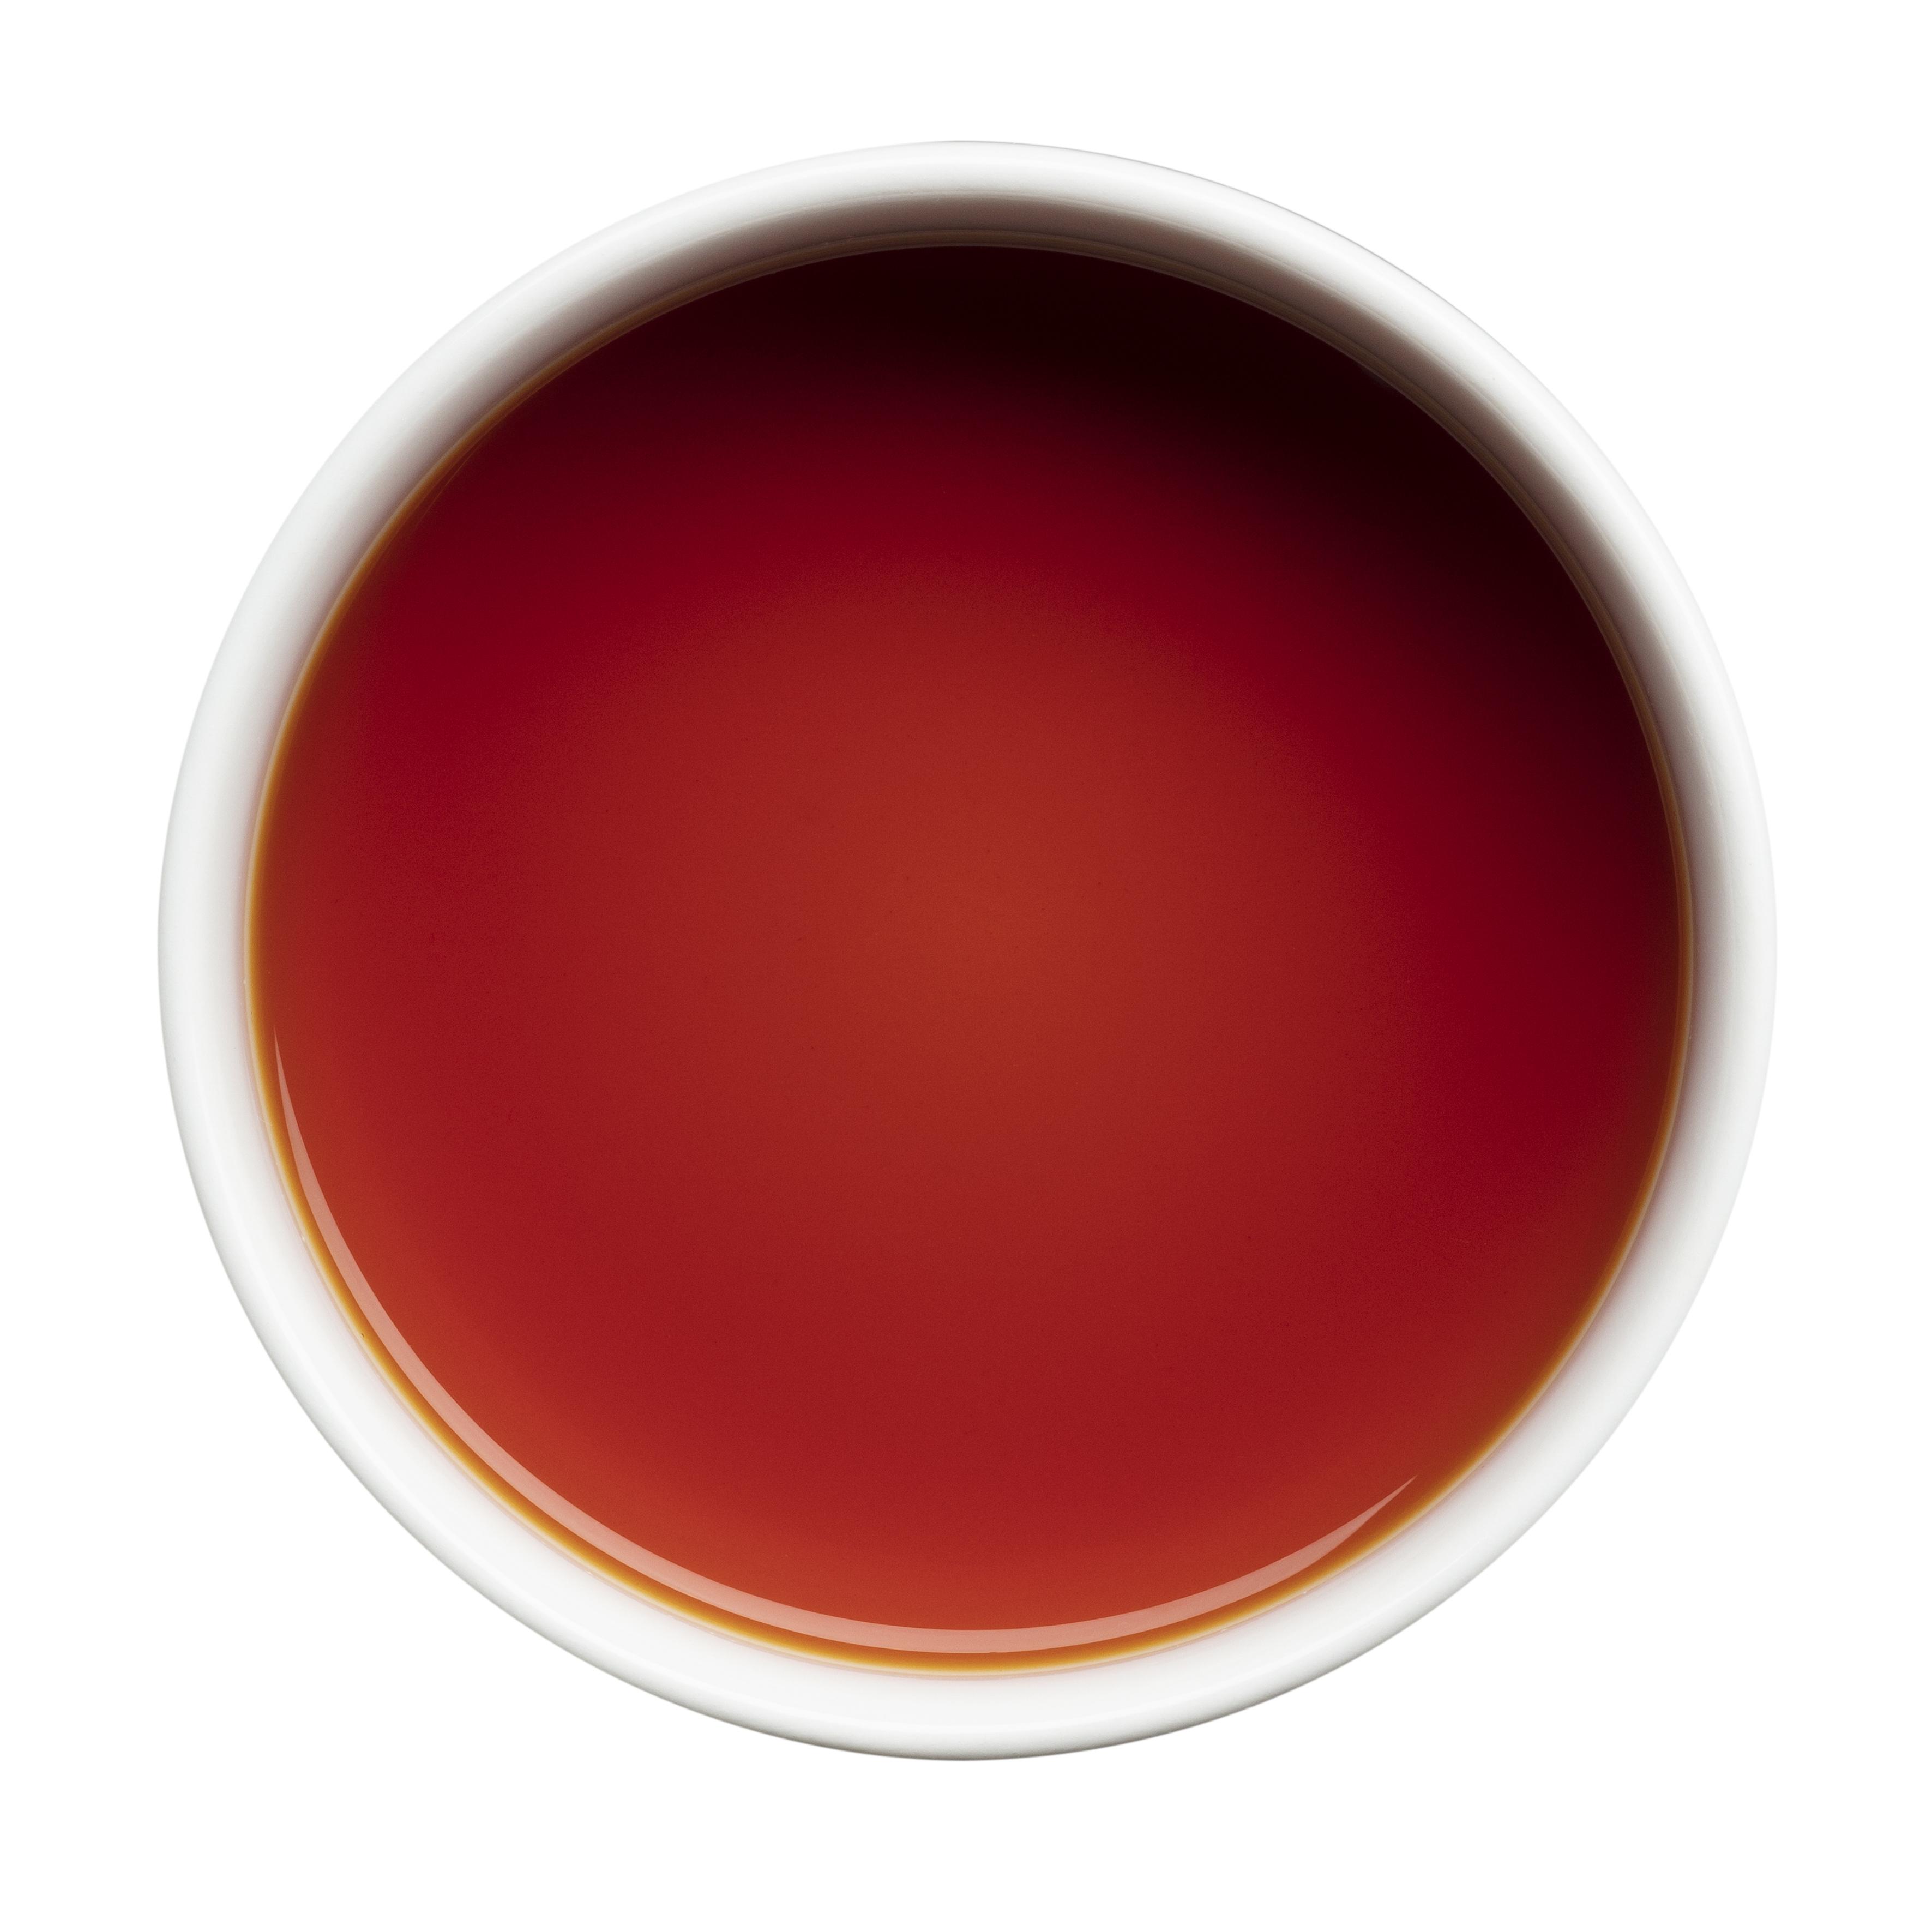 Oolong Organic Te - China